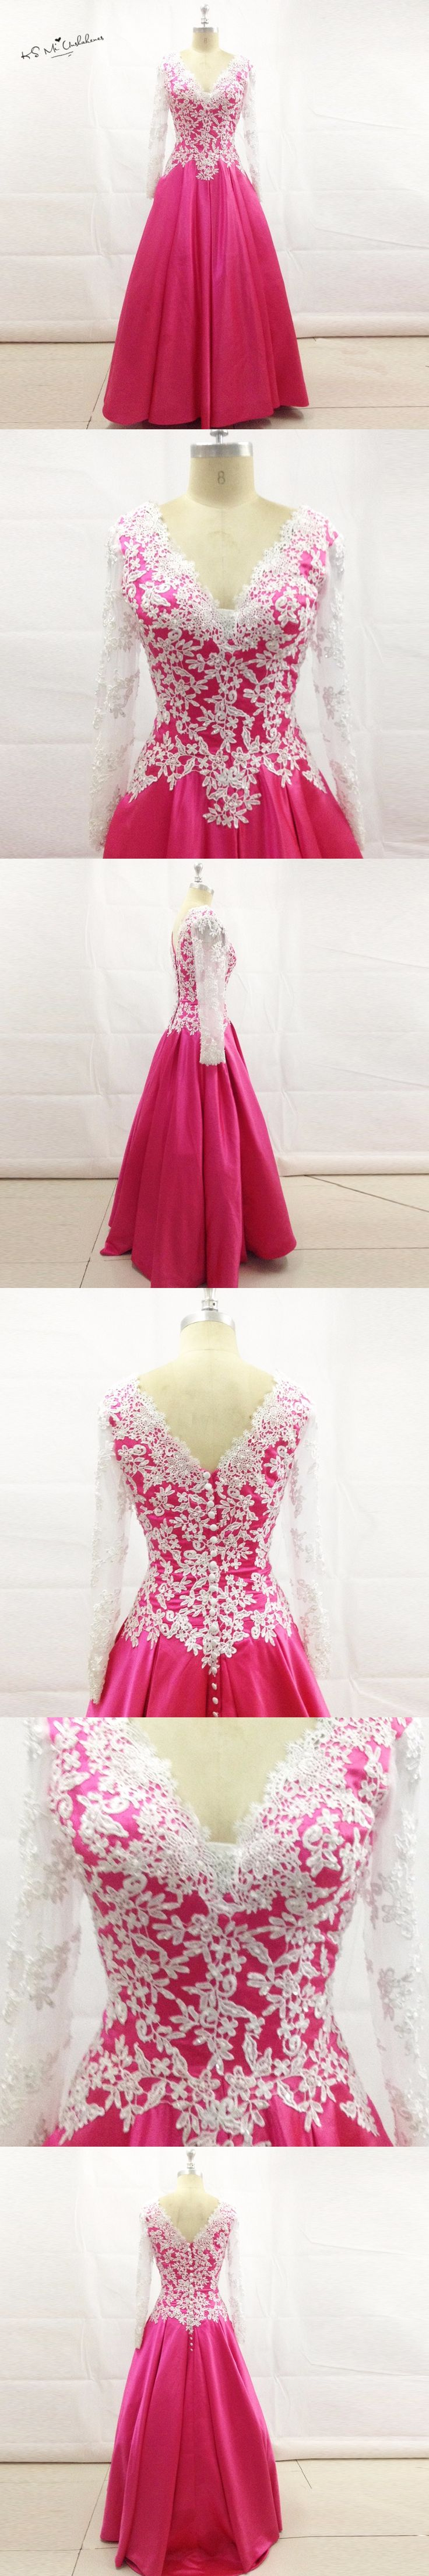 Mejores 97 imágenes de Quinceanera Dresses en Pinterest